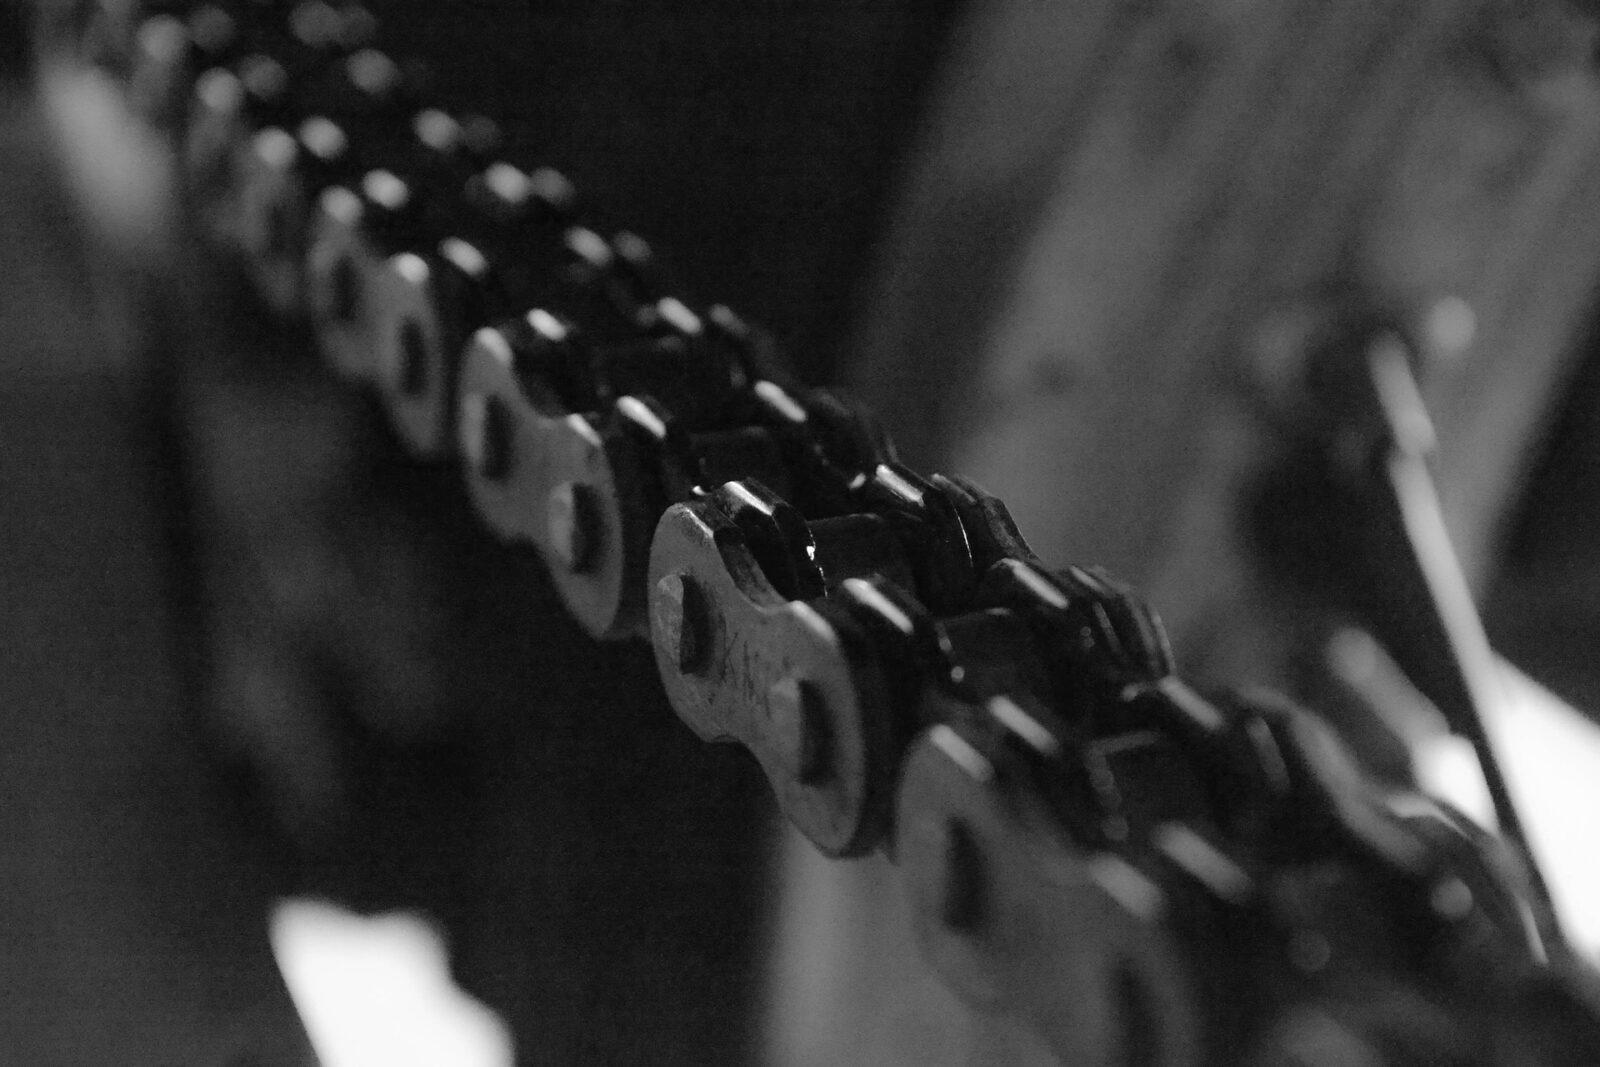 Motorcross chain